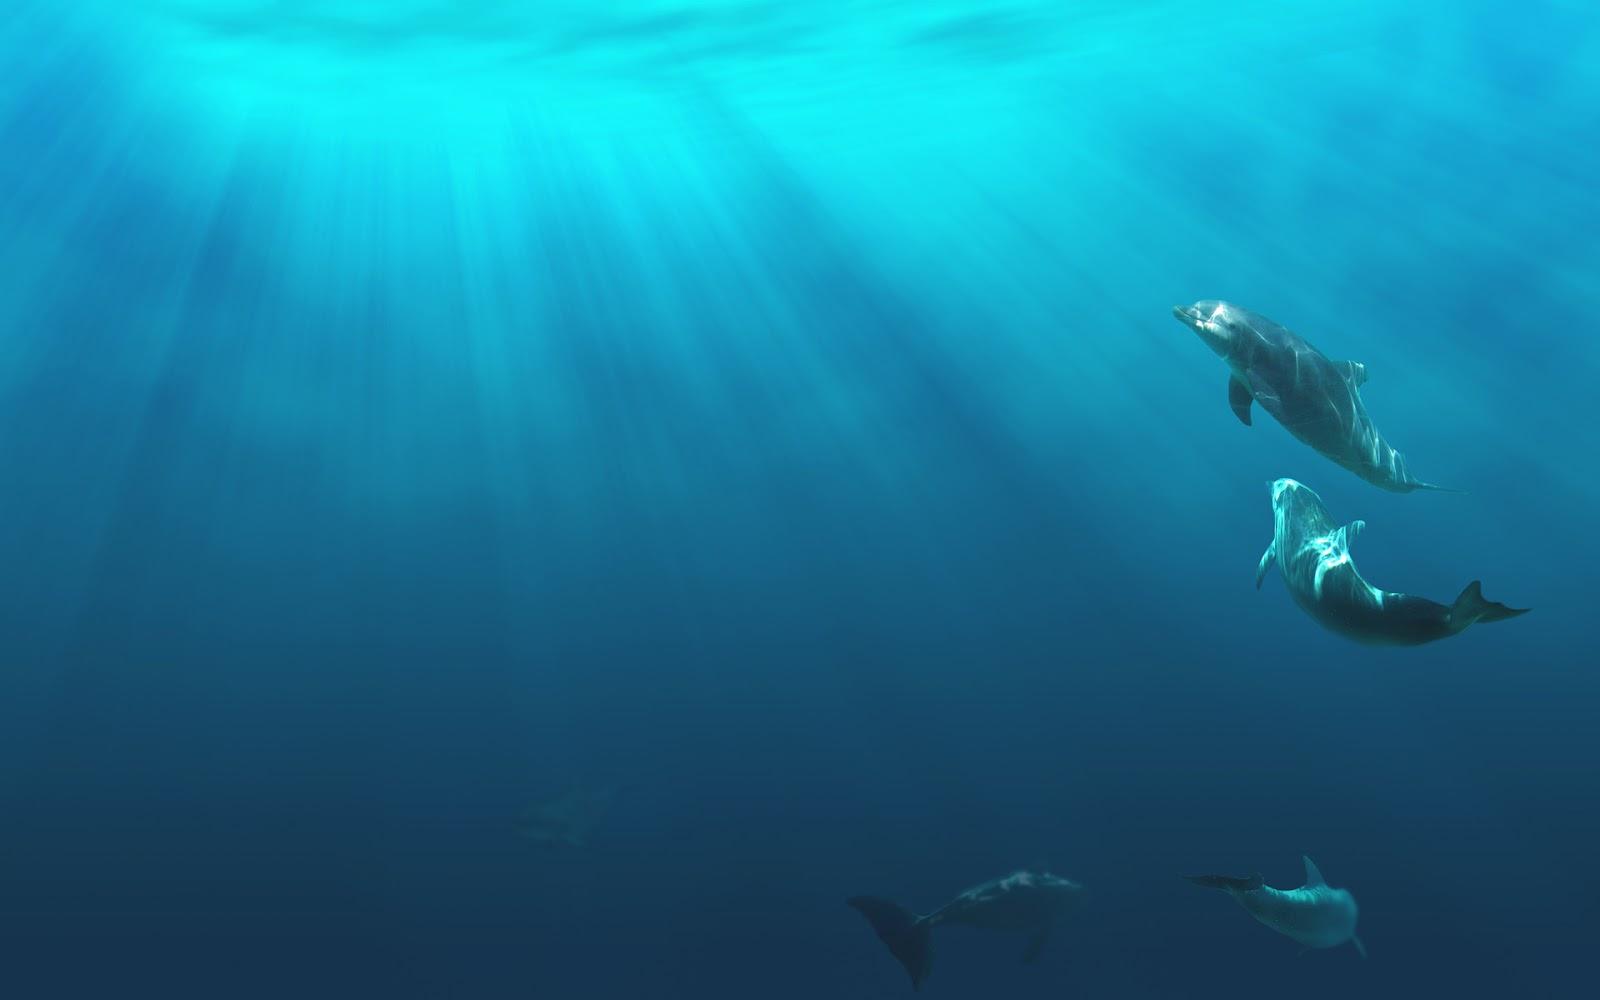 200 <b>Dolphin</b> HD <b>Wallpapers</b>   Backgrounds - <b>Wallpaper</b> Abyss